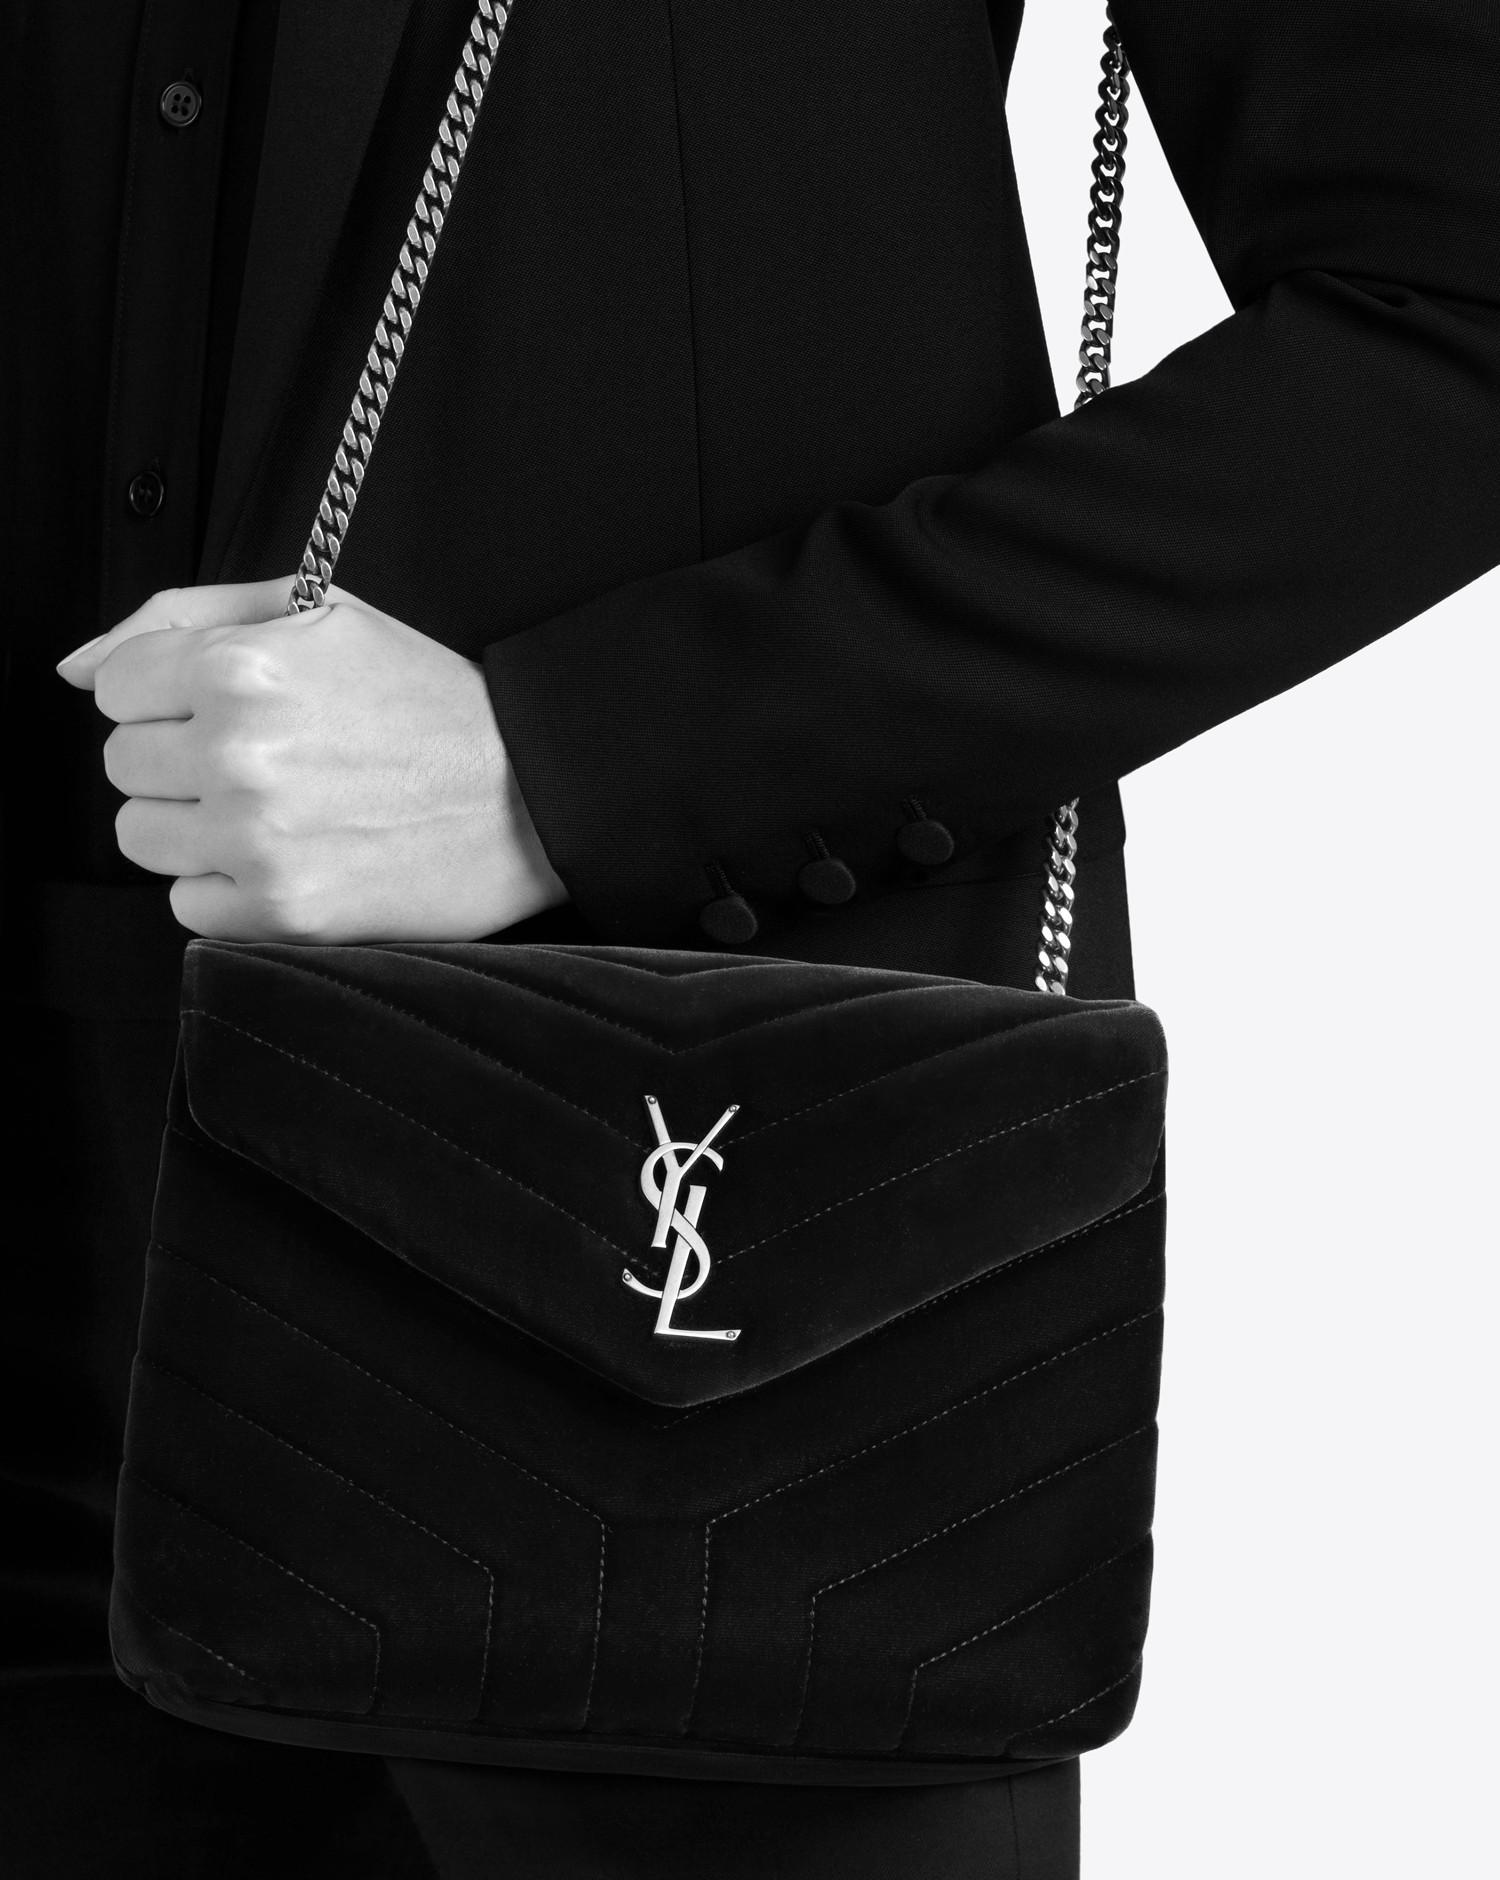 5549c7d84afd Lyst - Saint Laurent Small Loulou Chain Bag In Black